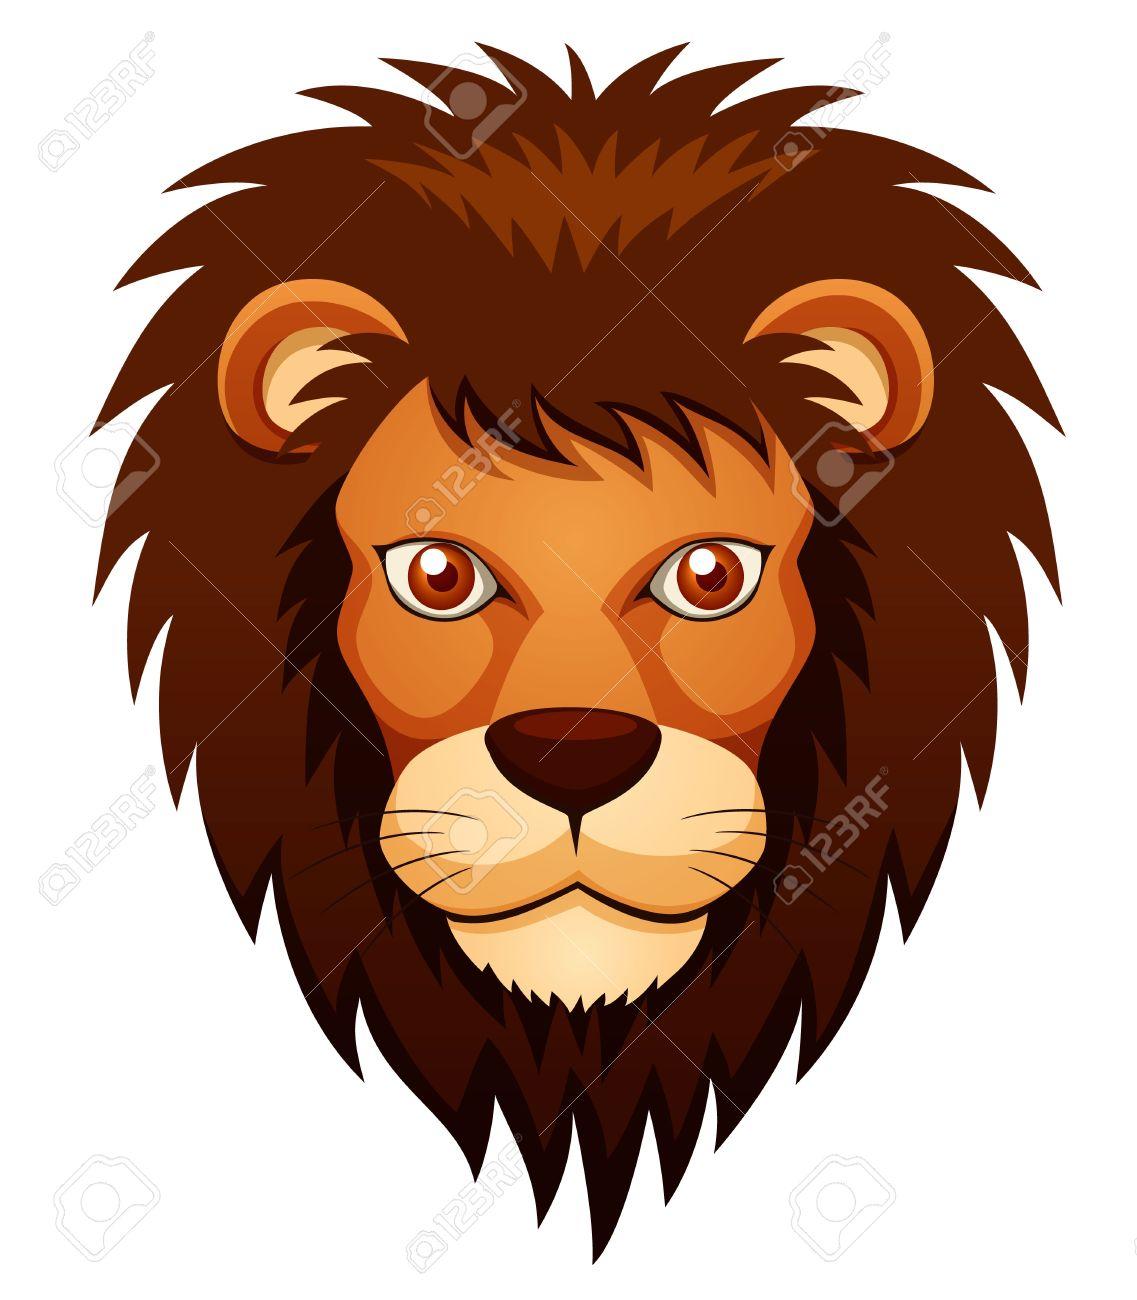 illustration of lion face